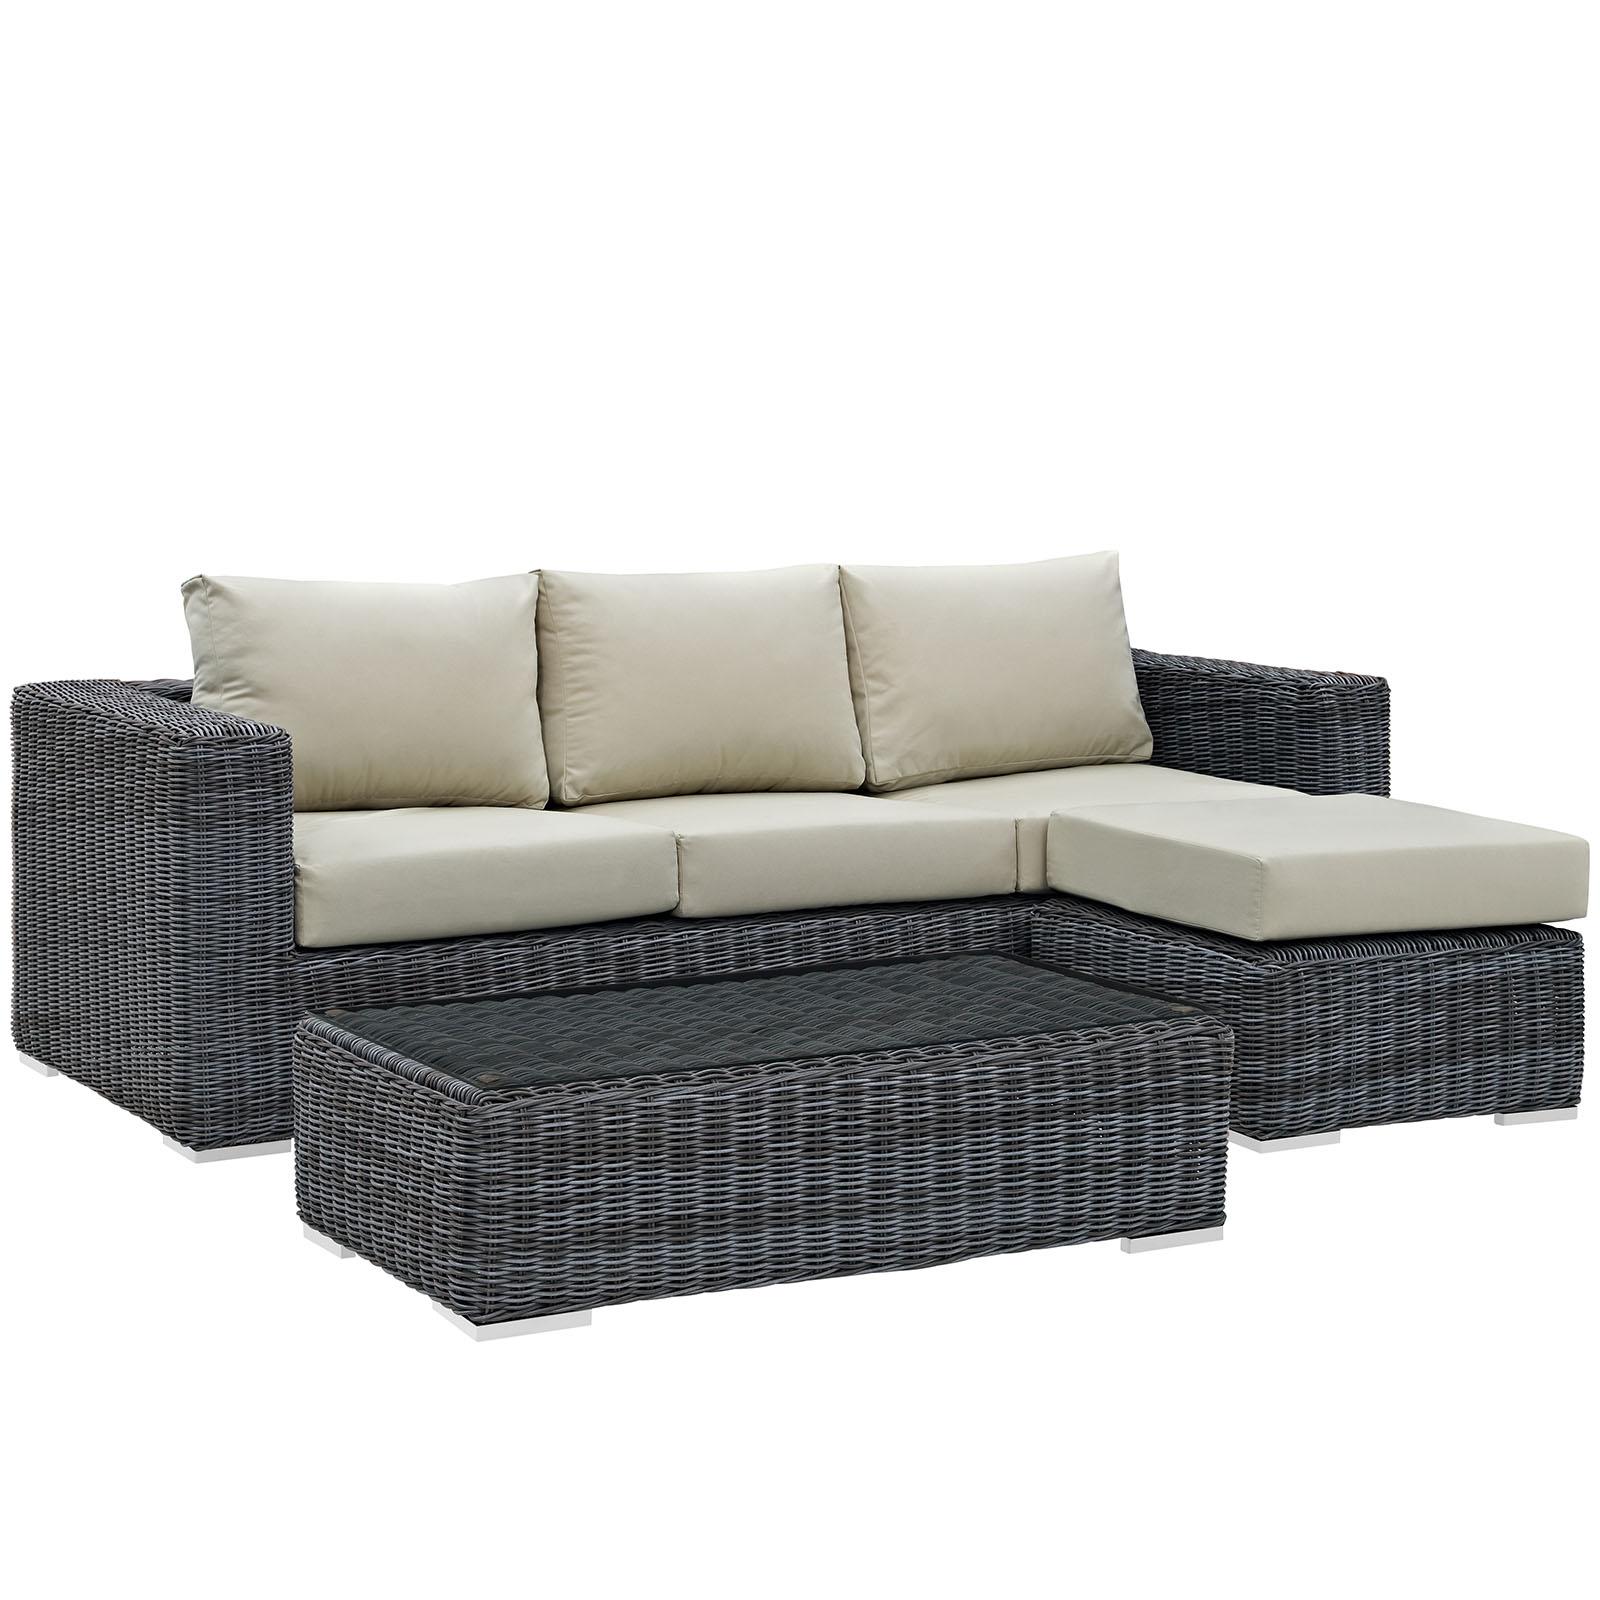 Modern Contemporary Urban Design Living Lounge Room Sectional Sofa Set, Beige, Rattan